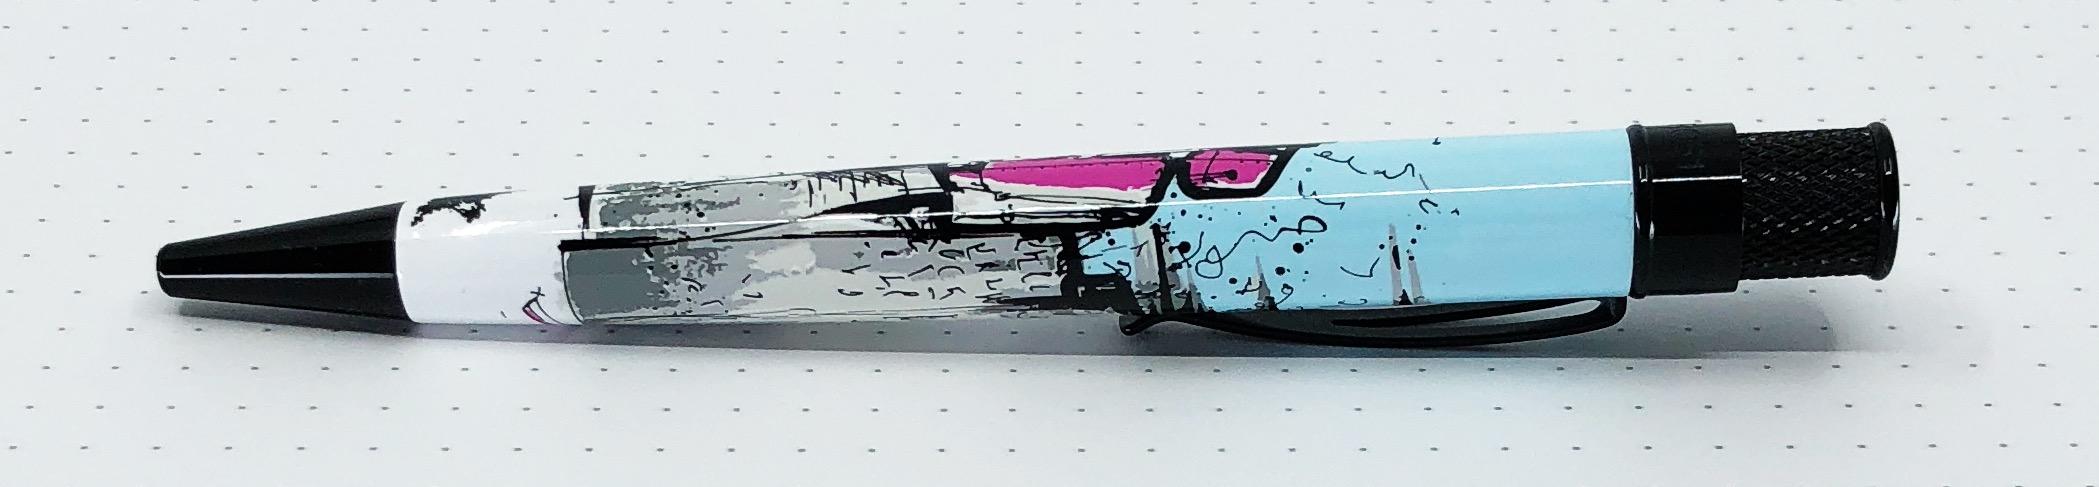 Pen Addict Retro 51 Pink Robots Side 3